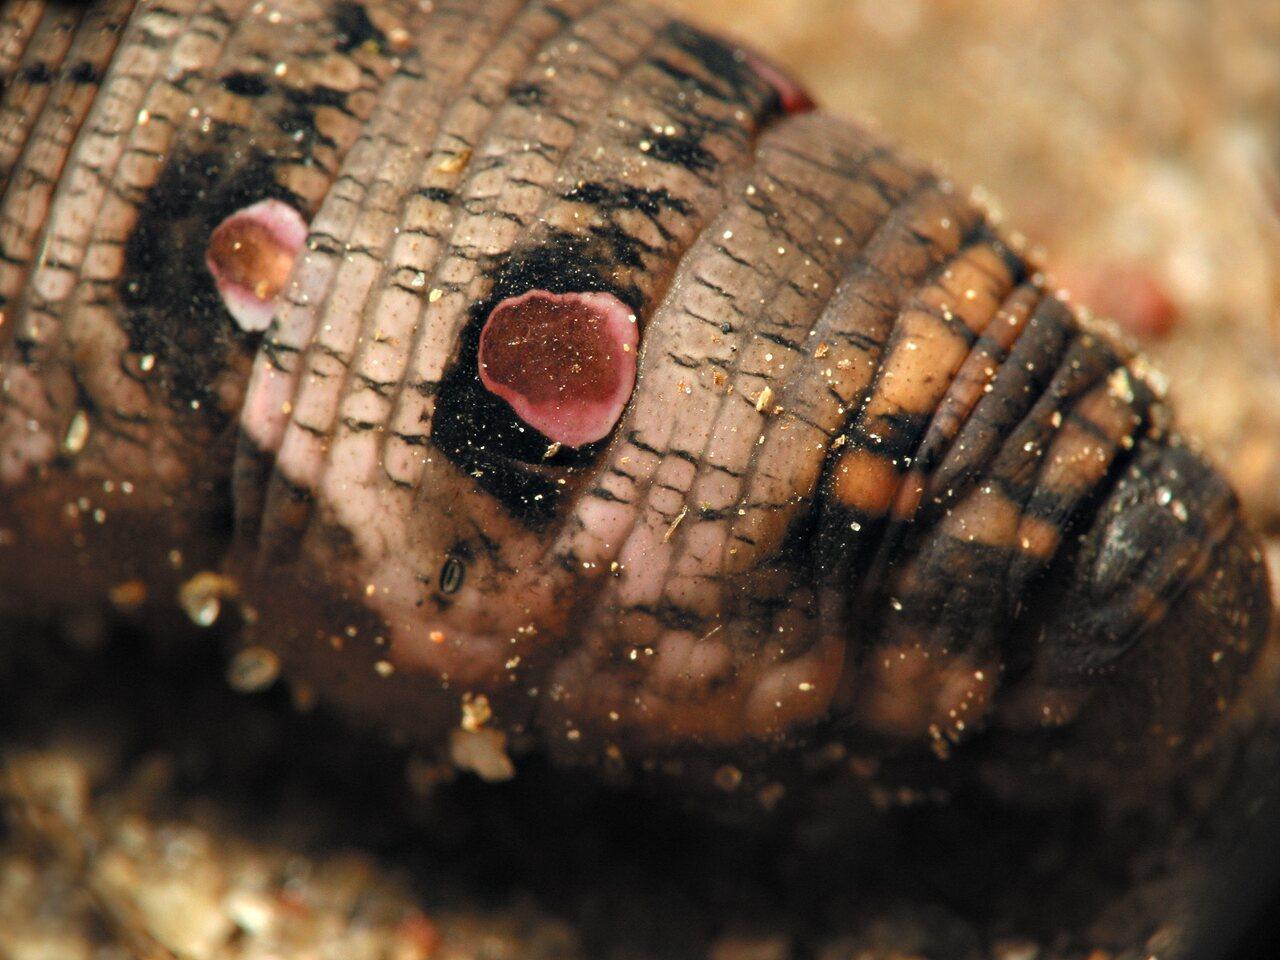 Deilephila-elpenor-larva-6530.jpg